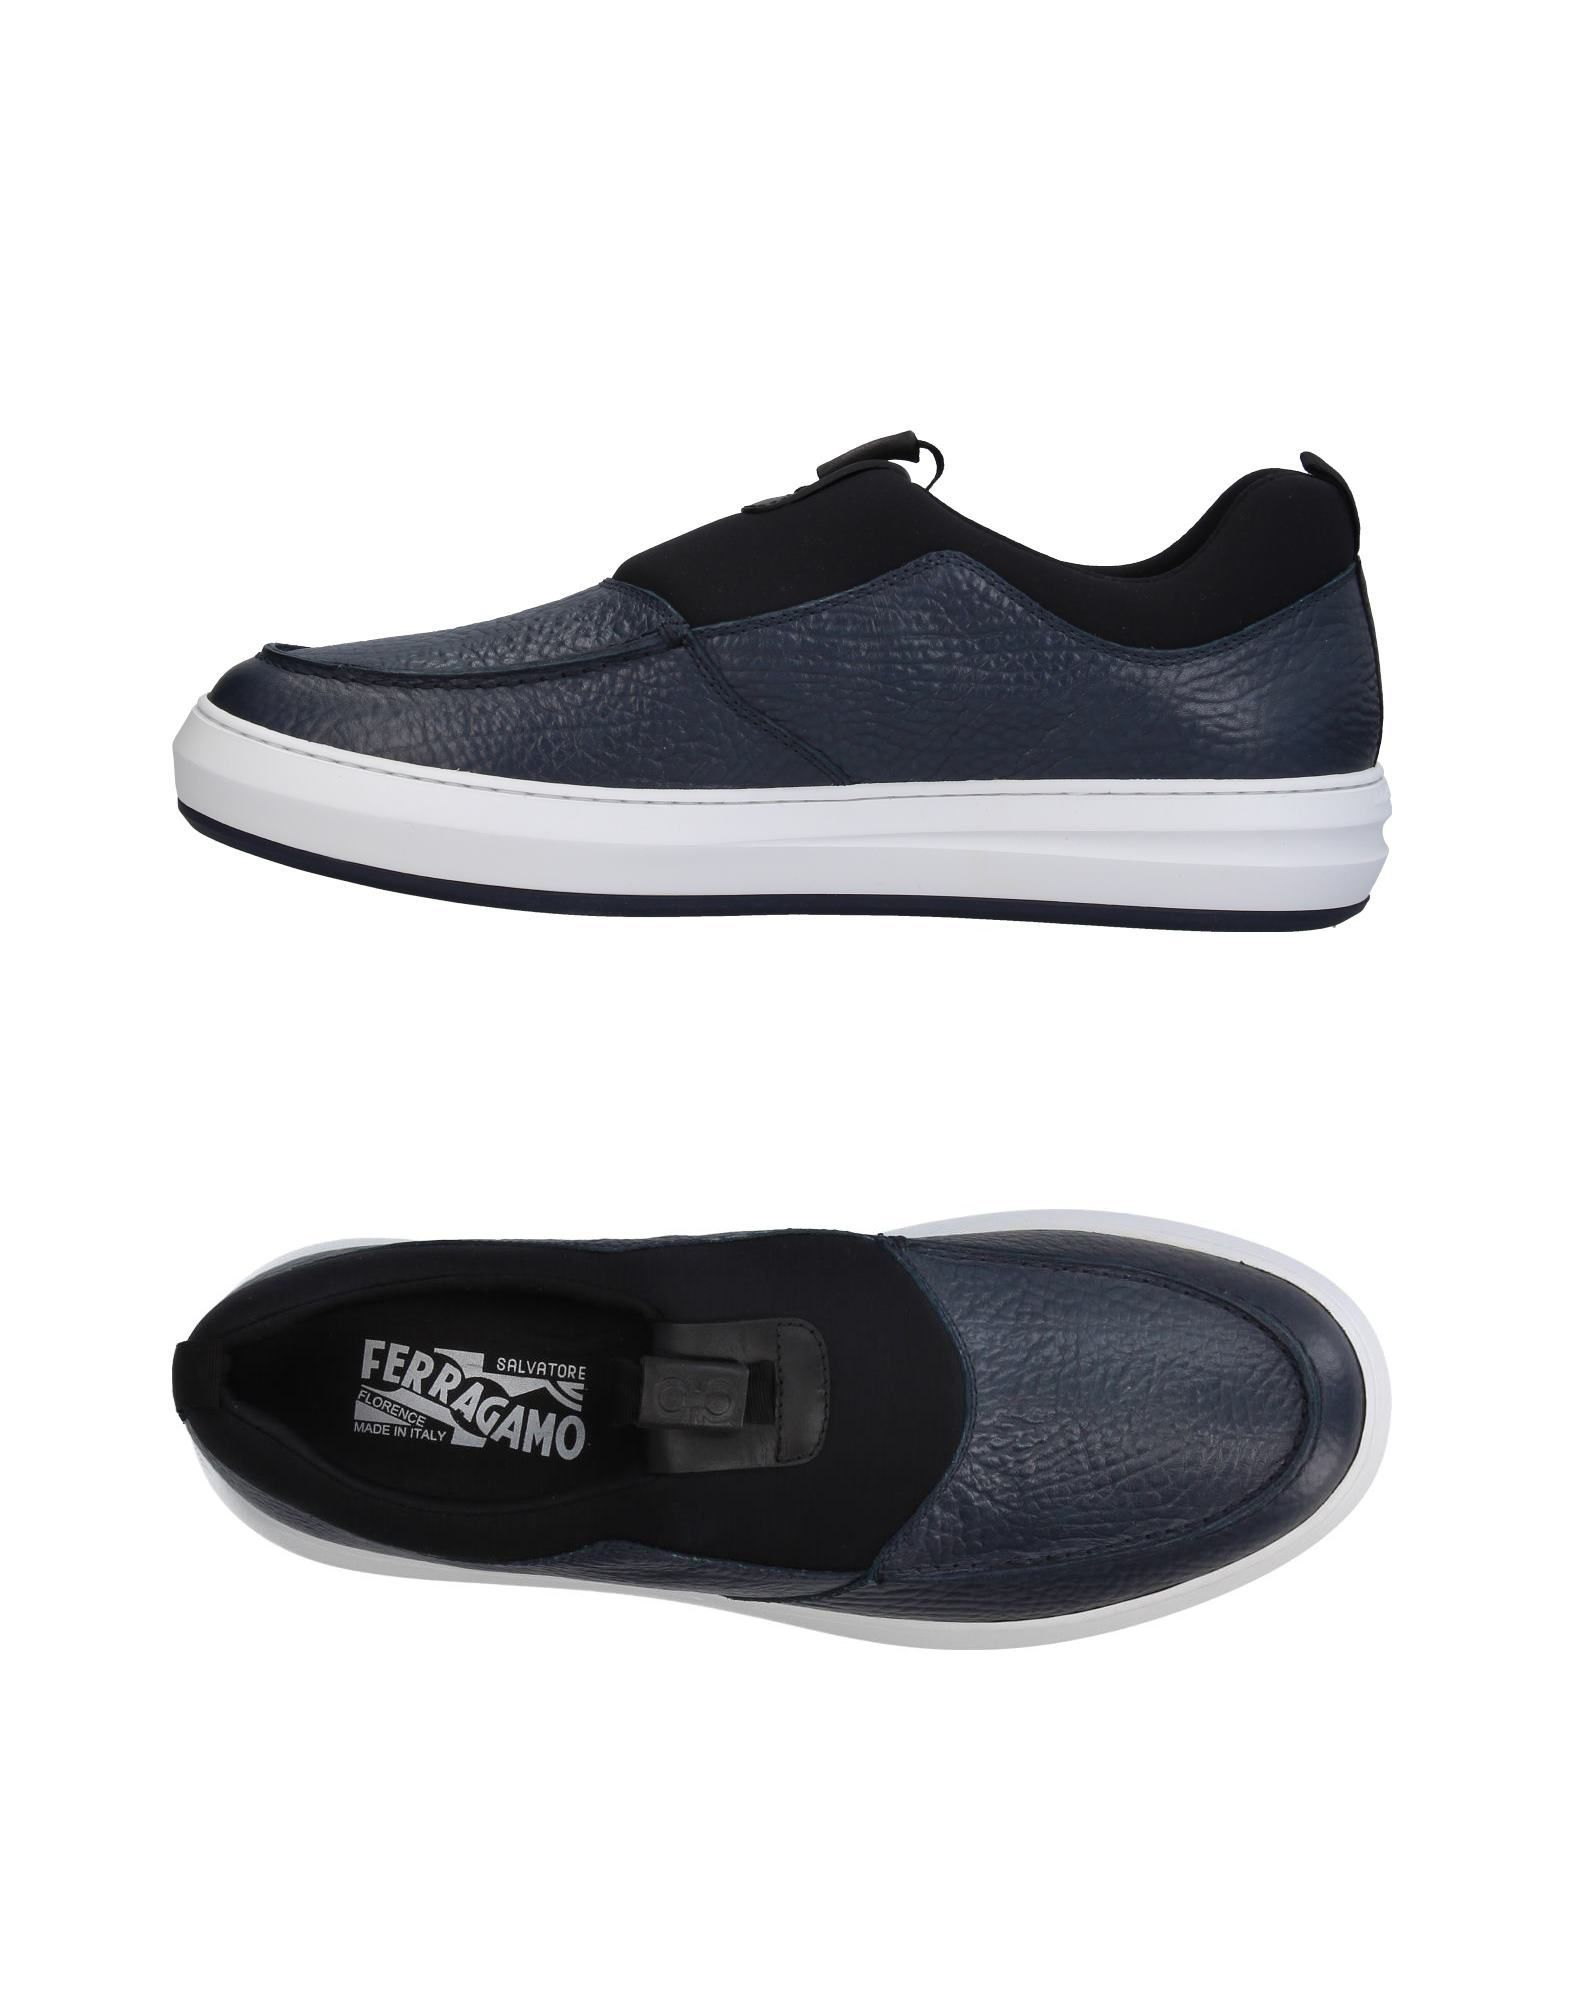 Salvatore Ferragamo Sneakers Herren  11375954VH Gute Qualität beliebte Schuhe